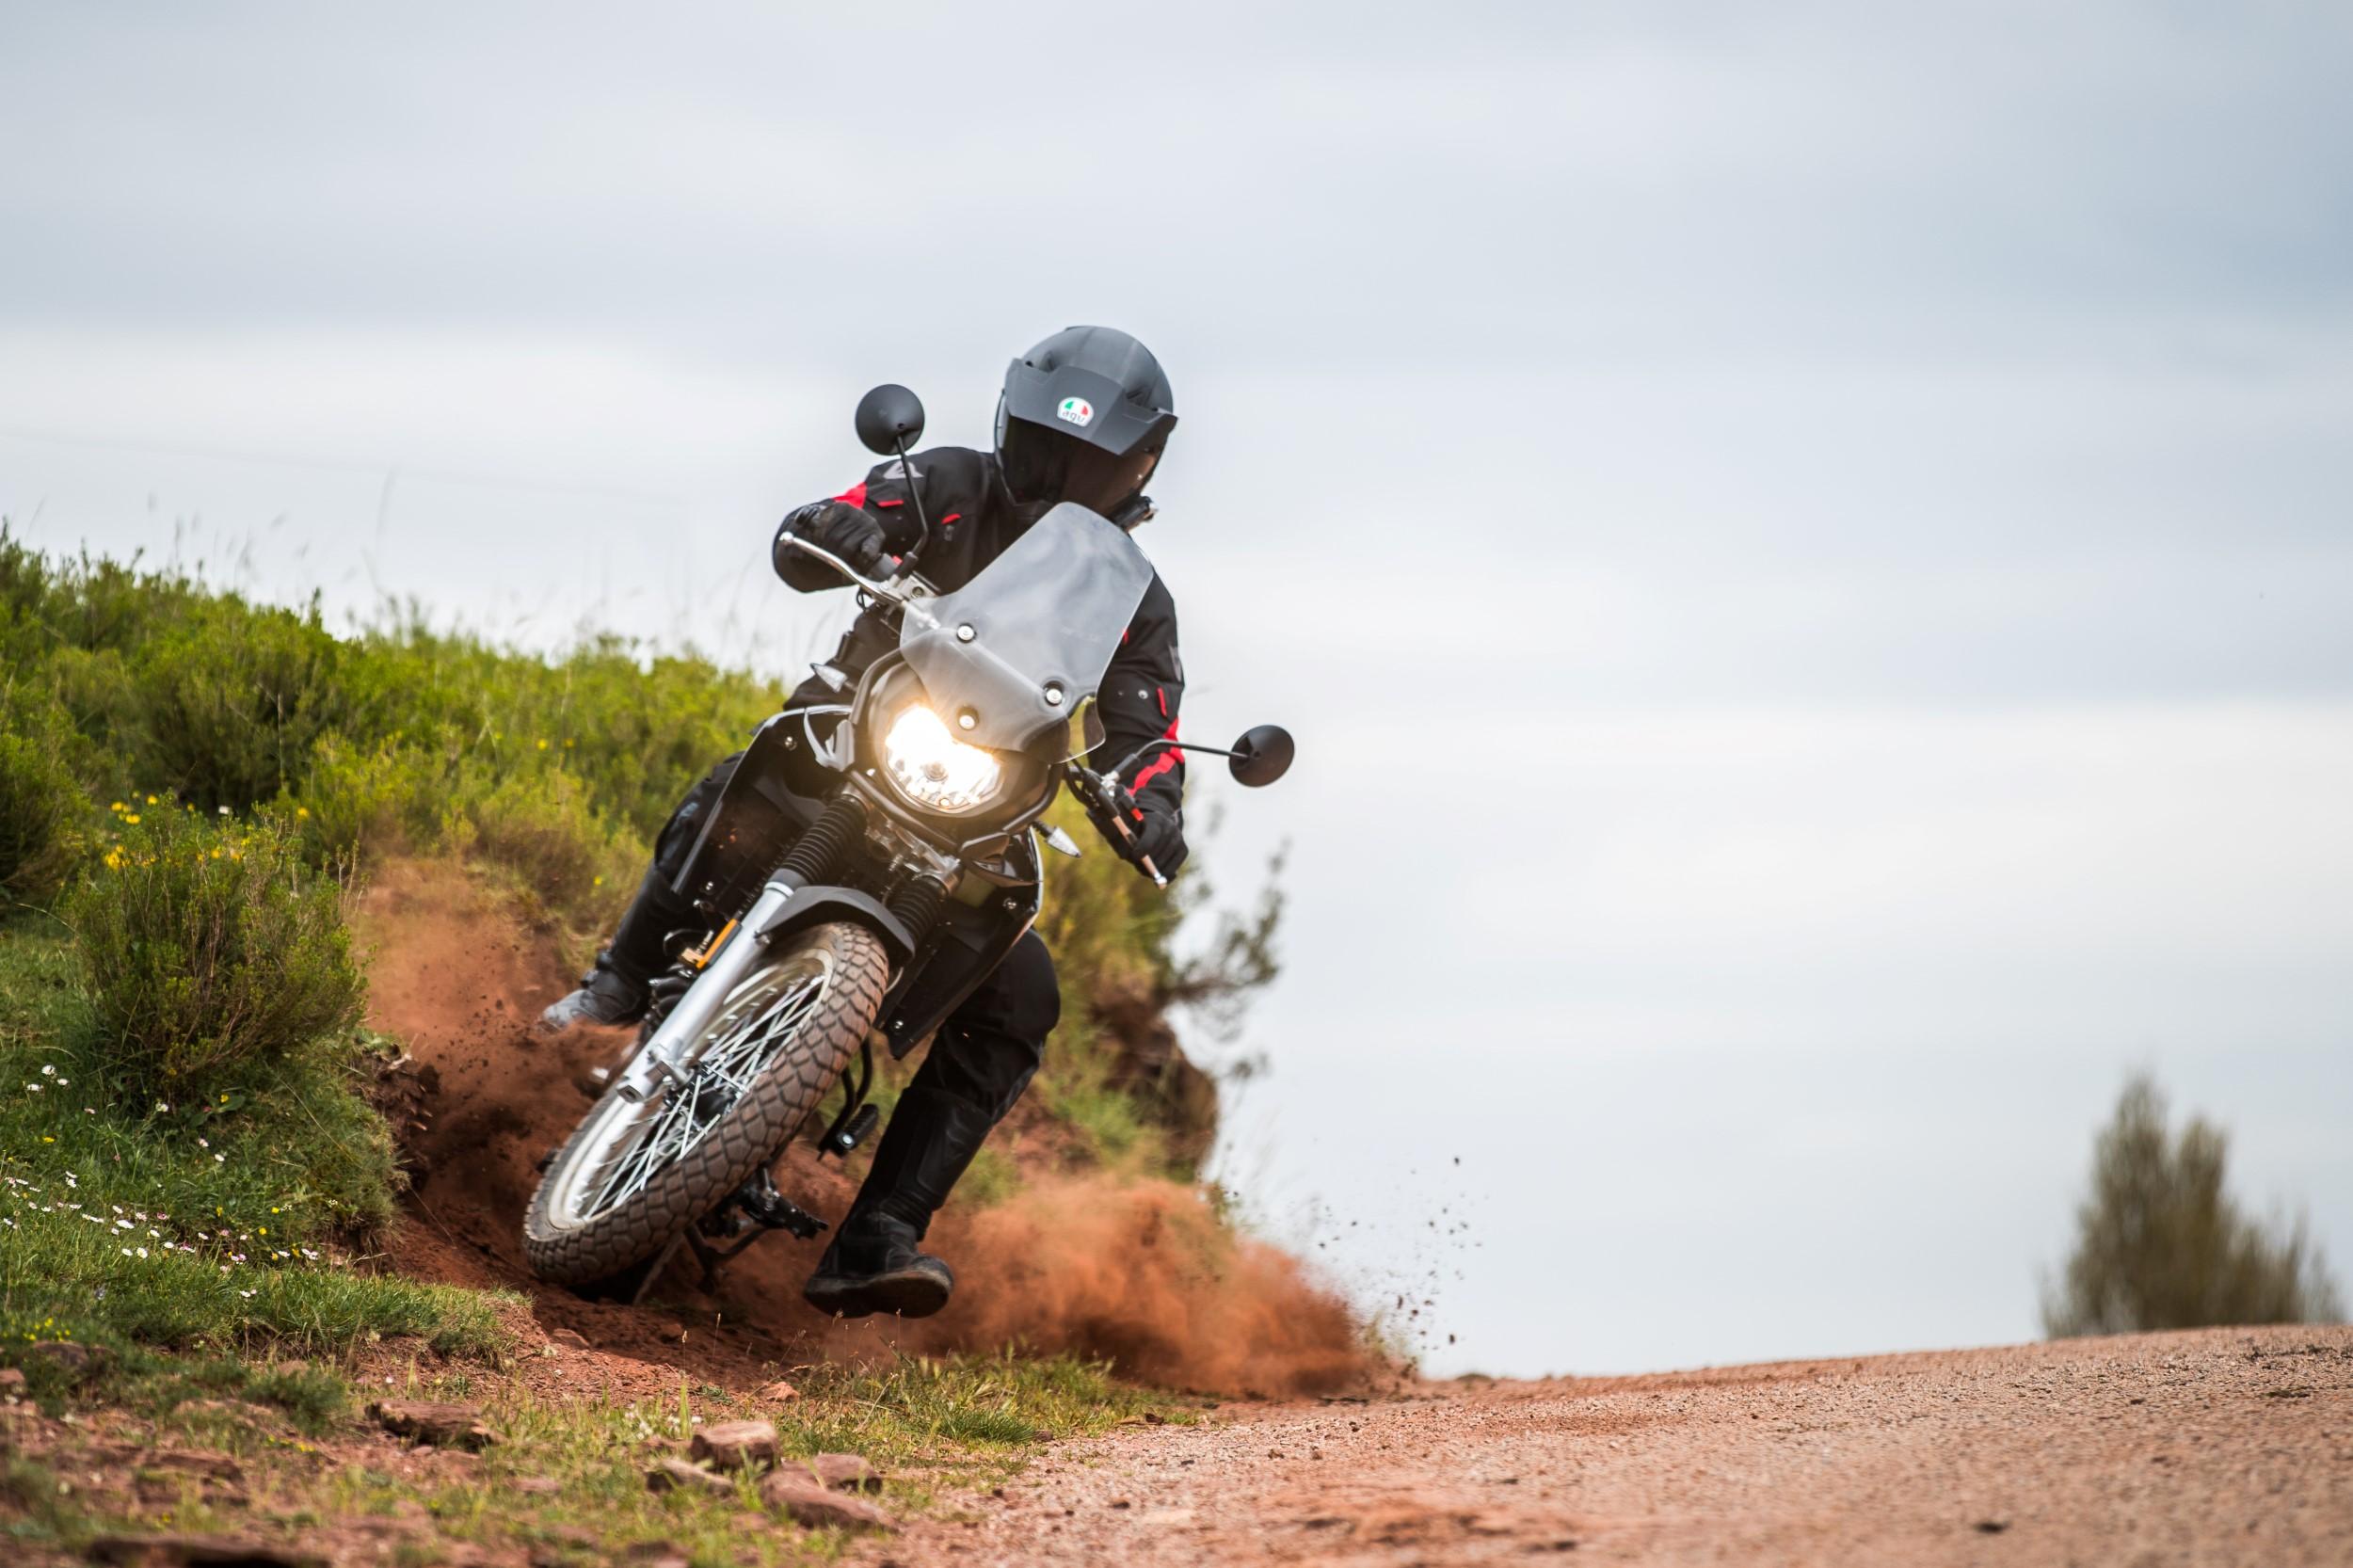 https://malaguti.bike/wp-content/uploads/sites/3/2021/08/dune-x-action-front.jpg